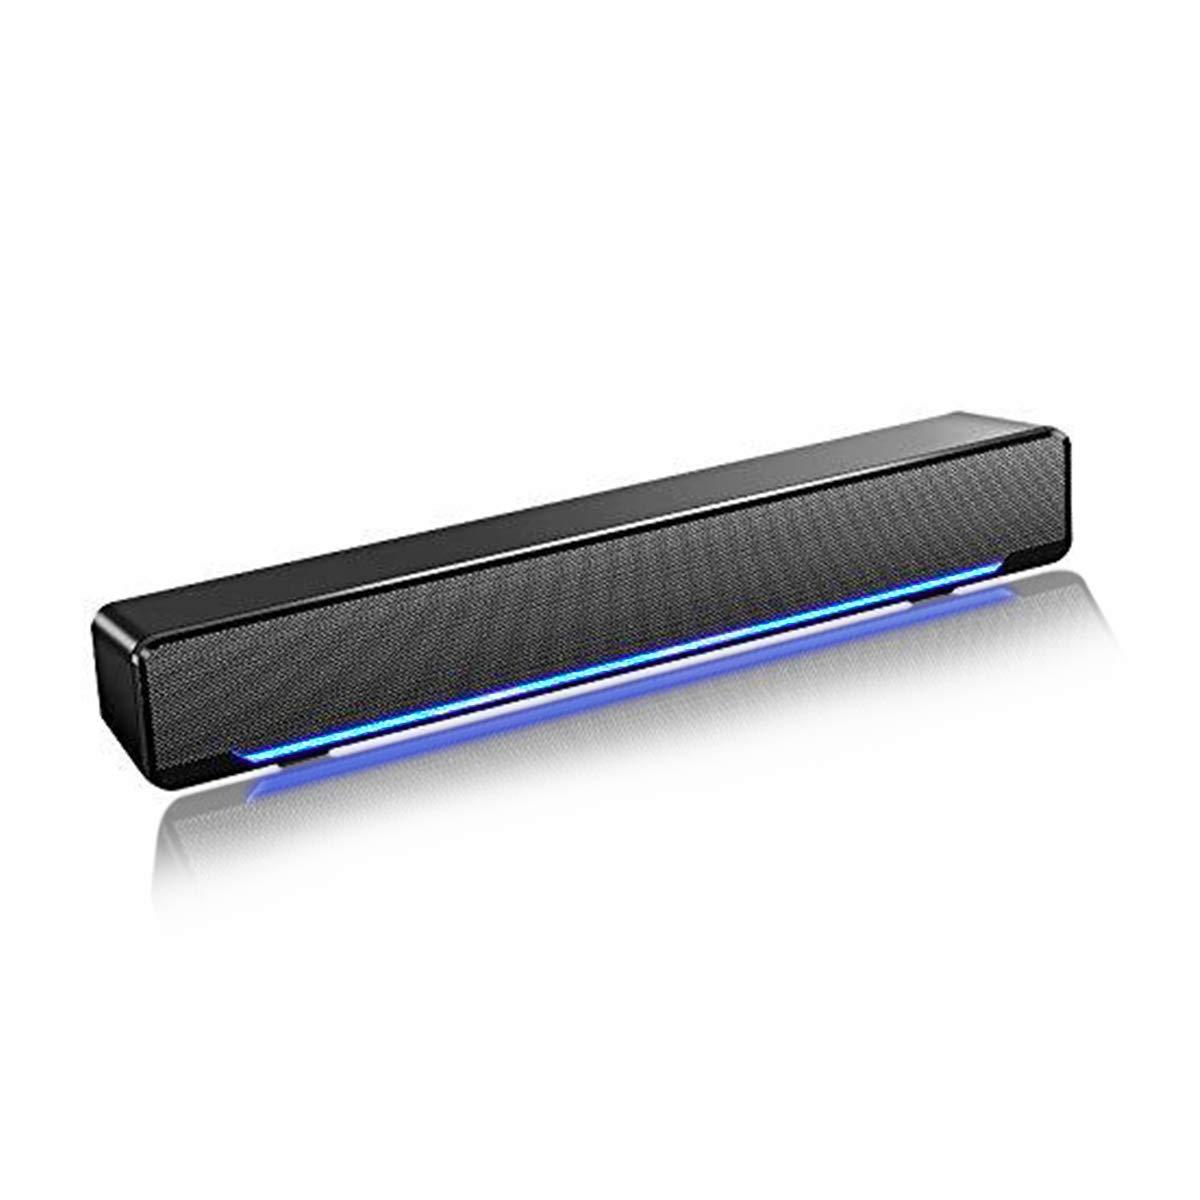 Soudbar, Maboo USB Powered Sound Bar Speakers for Computer Desktop Laptop PC, Black USB